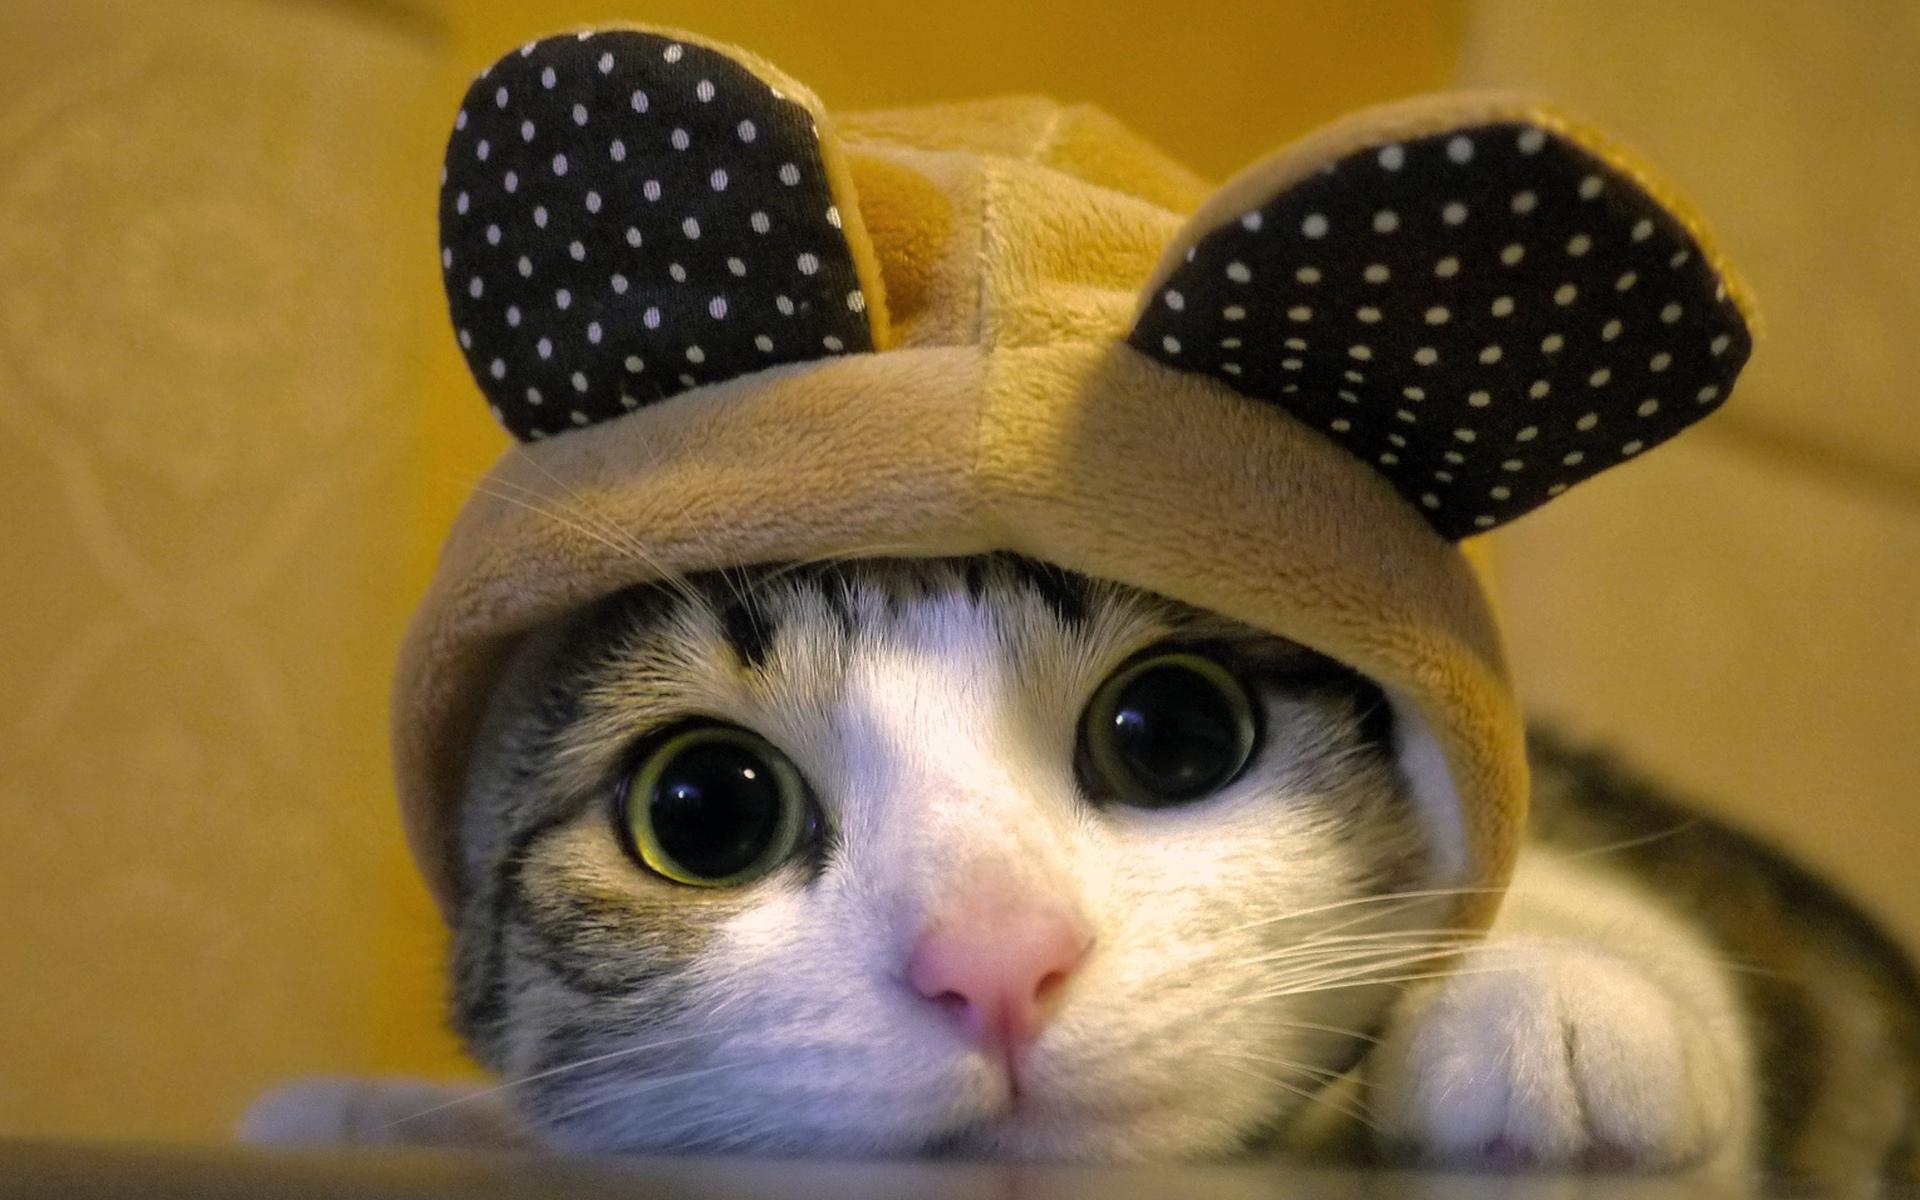 Wallpaper Px Hewan Kucing Kostum Imut